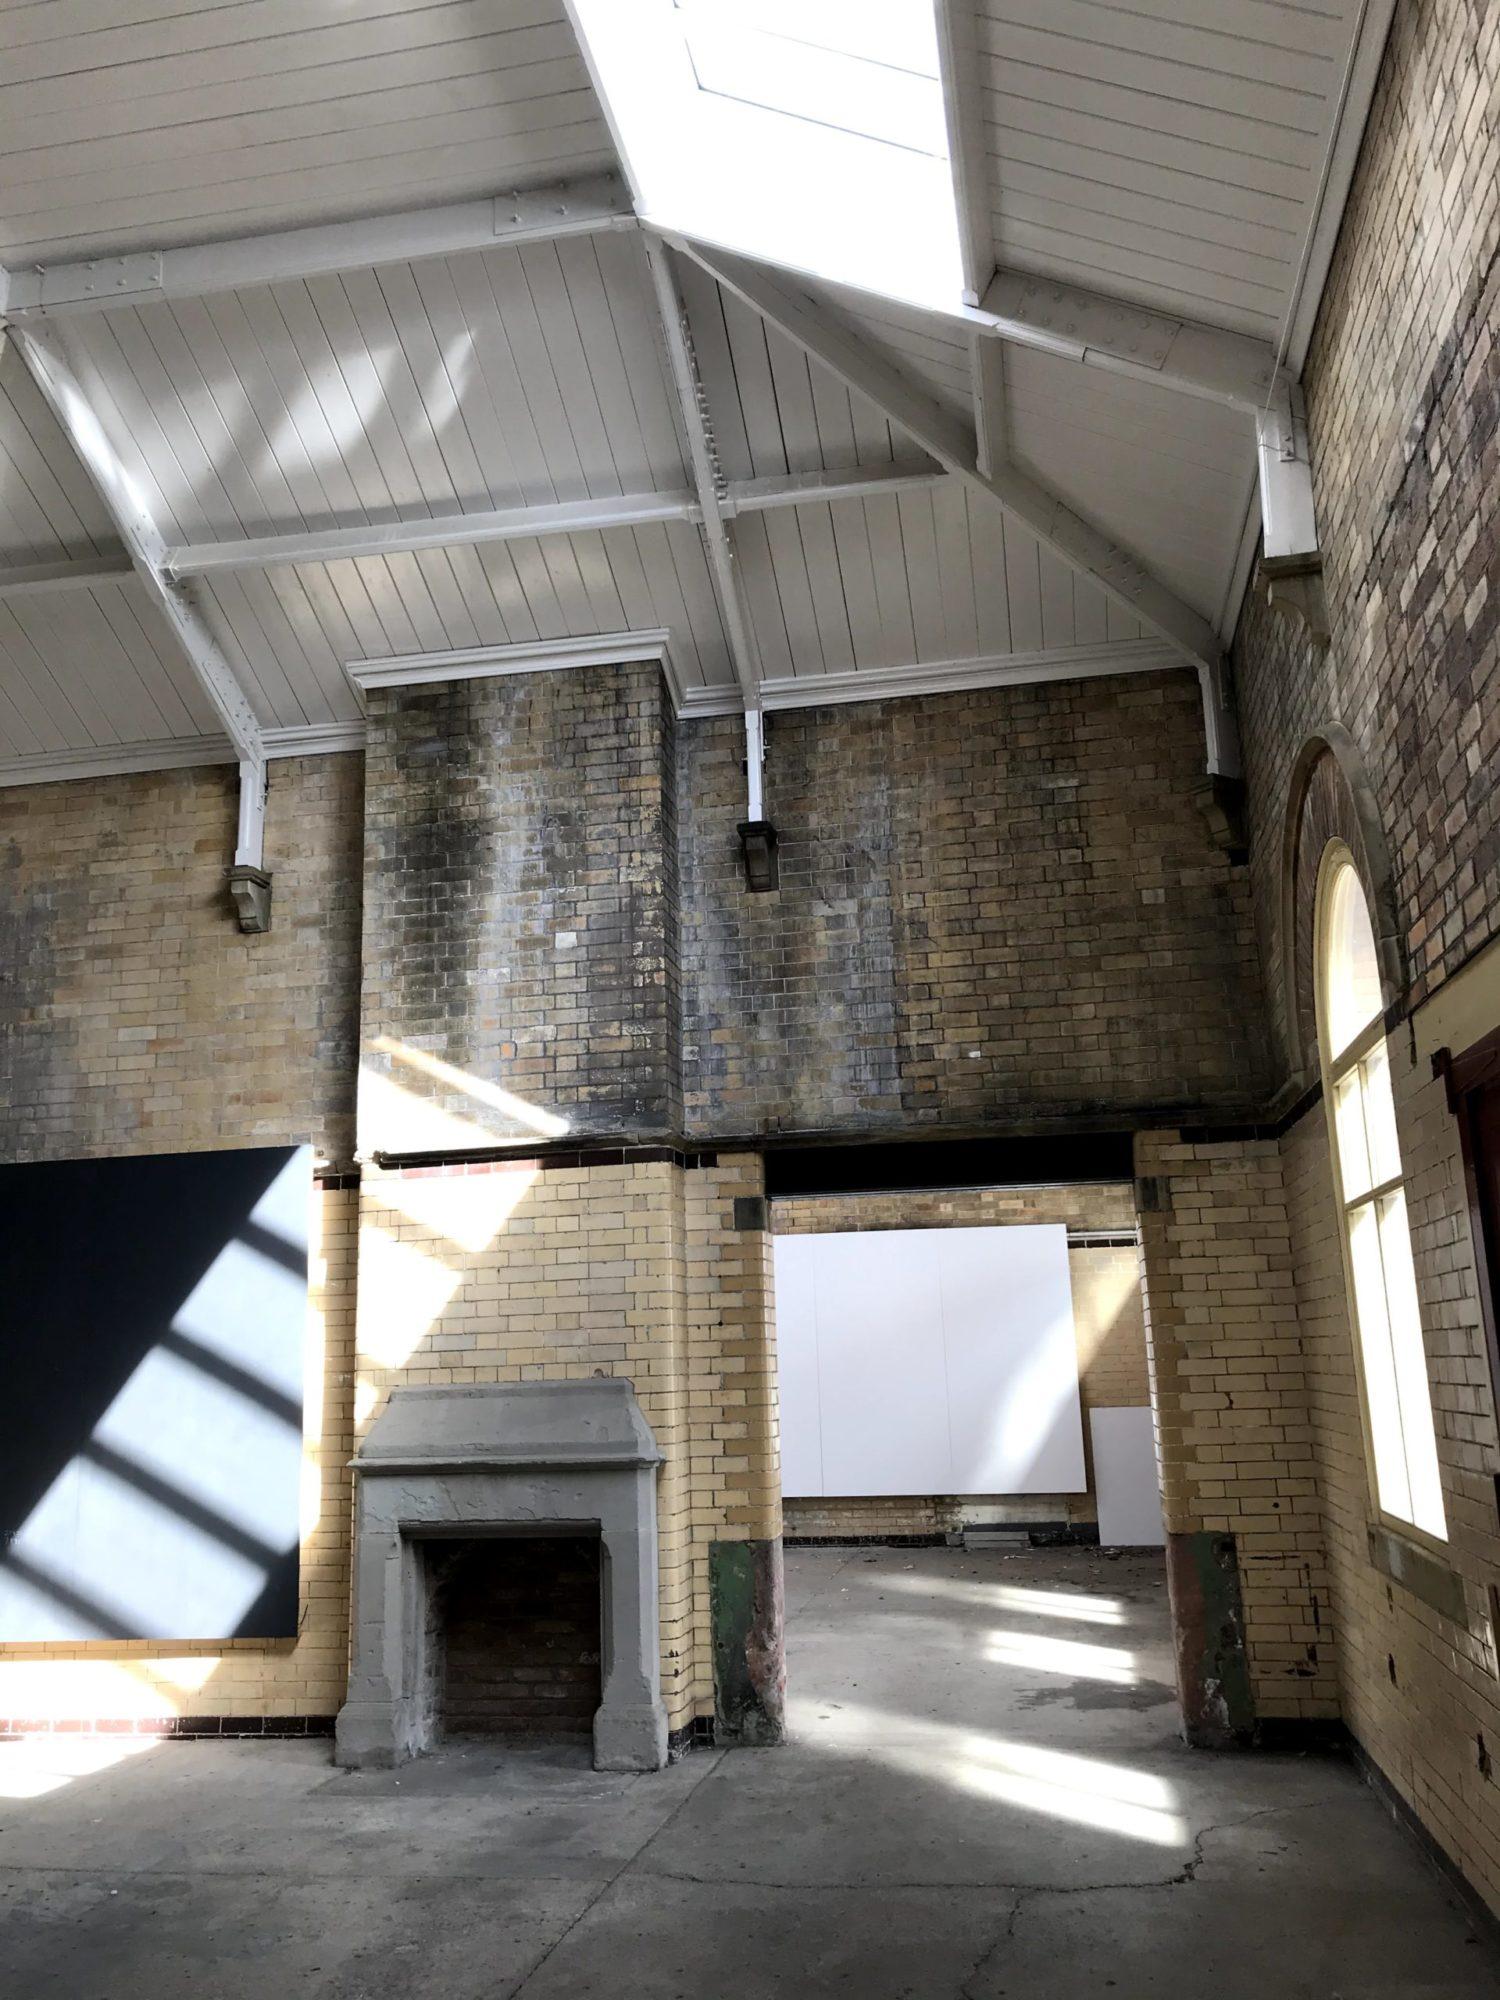 Old Parcels Office interior